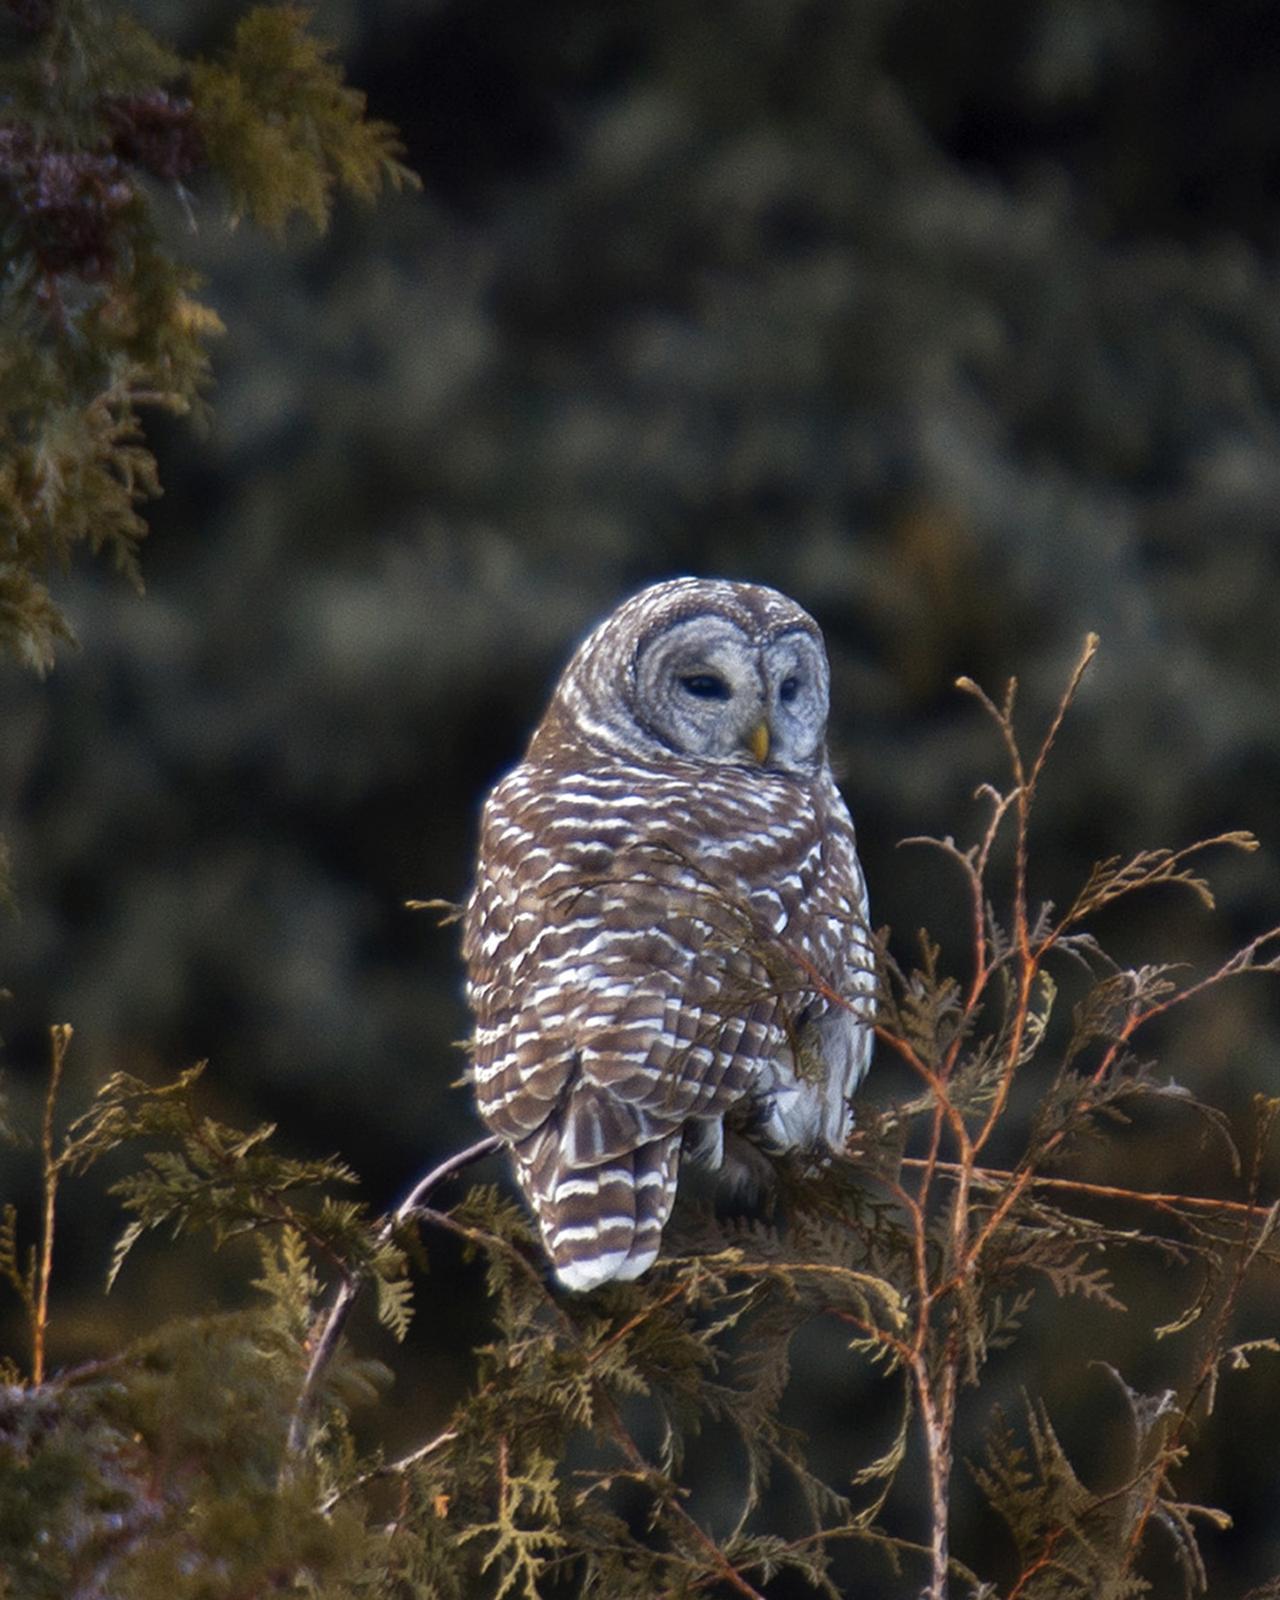 Barred Owl Photo by James Hawley